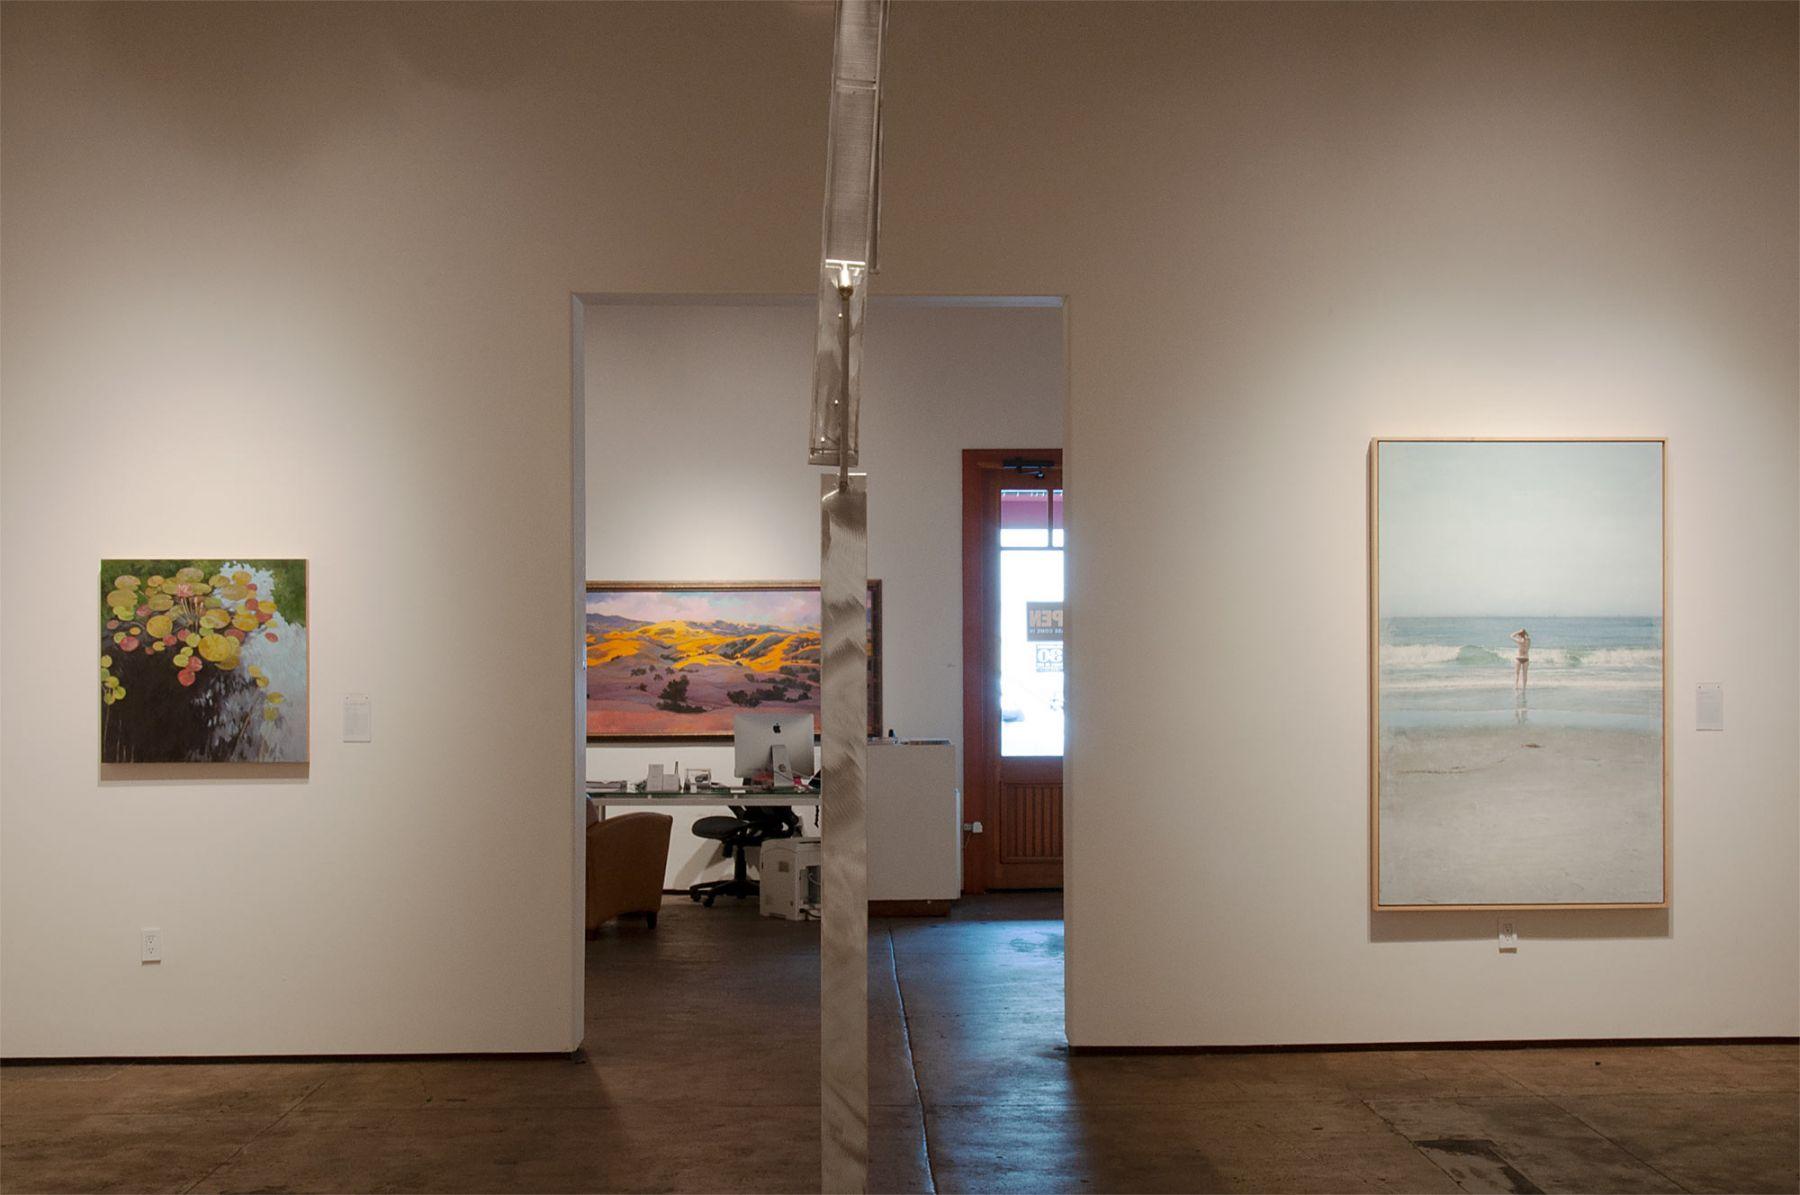 MASTERWORKS OF THE ARTISTS OF SULLIVAN GOSS exhibition, Nicole Strasburg, Ken Bortolazzo, Robin Gowen, John Nava